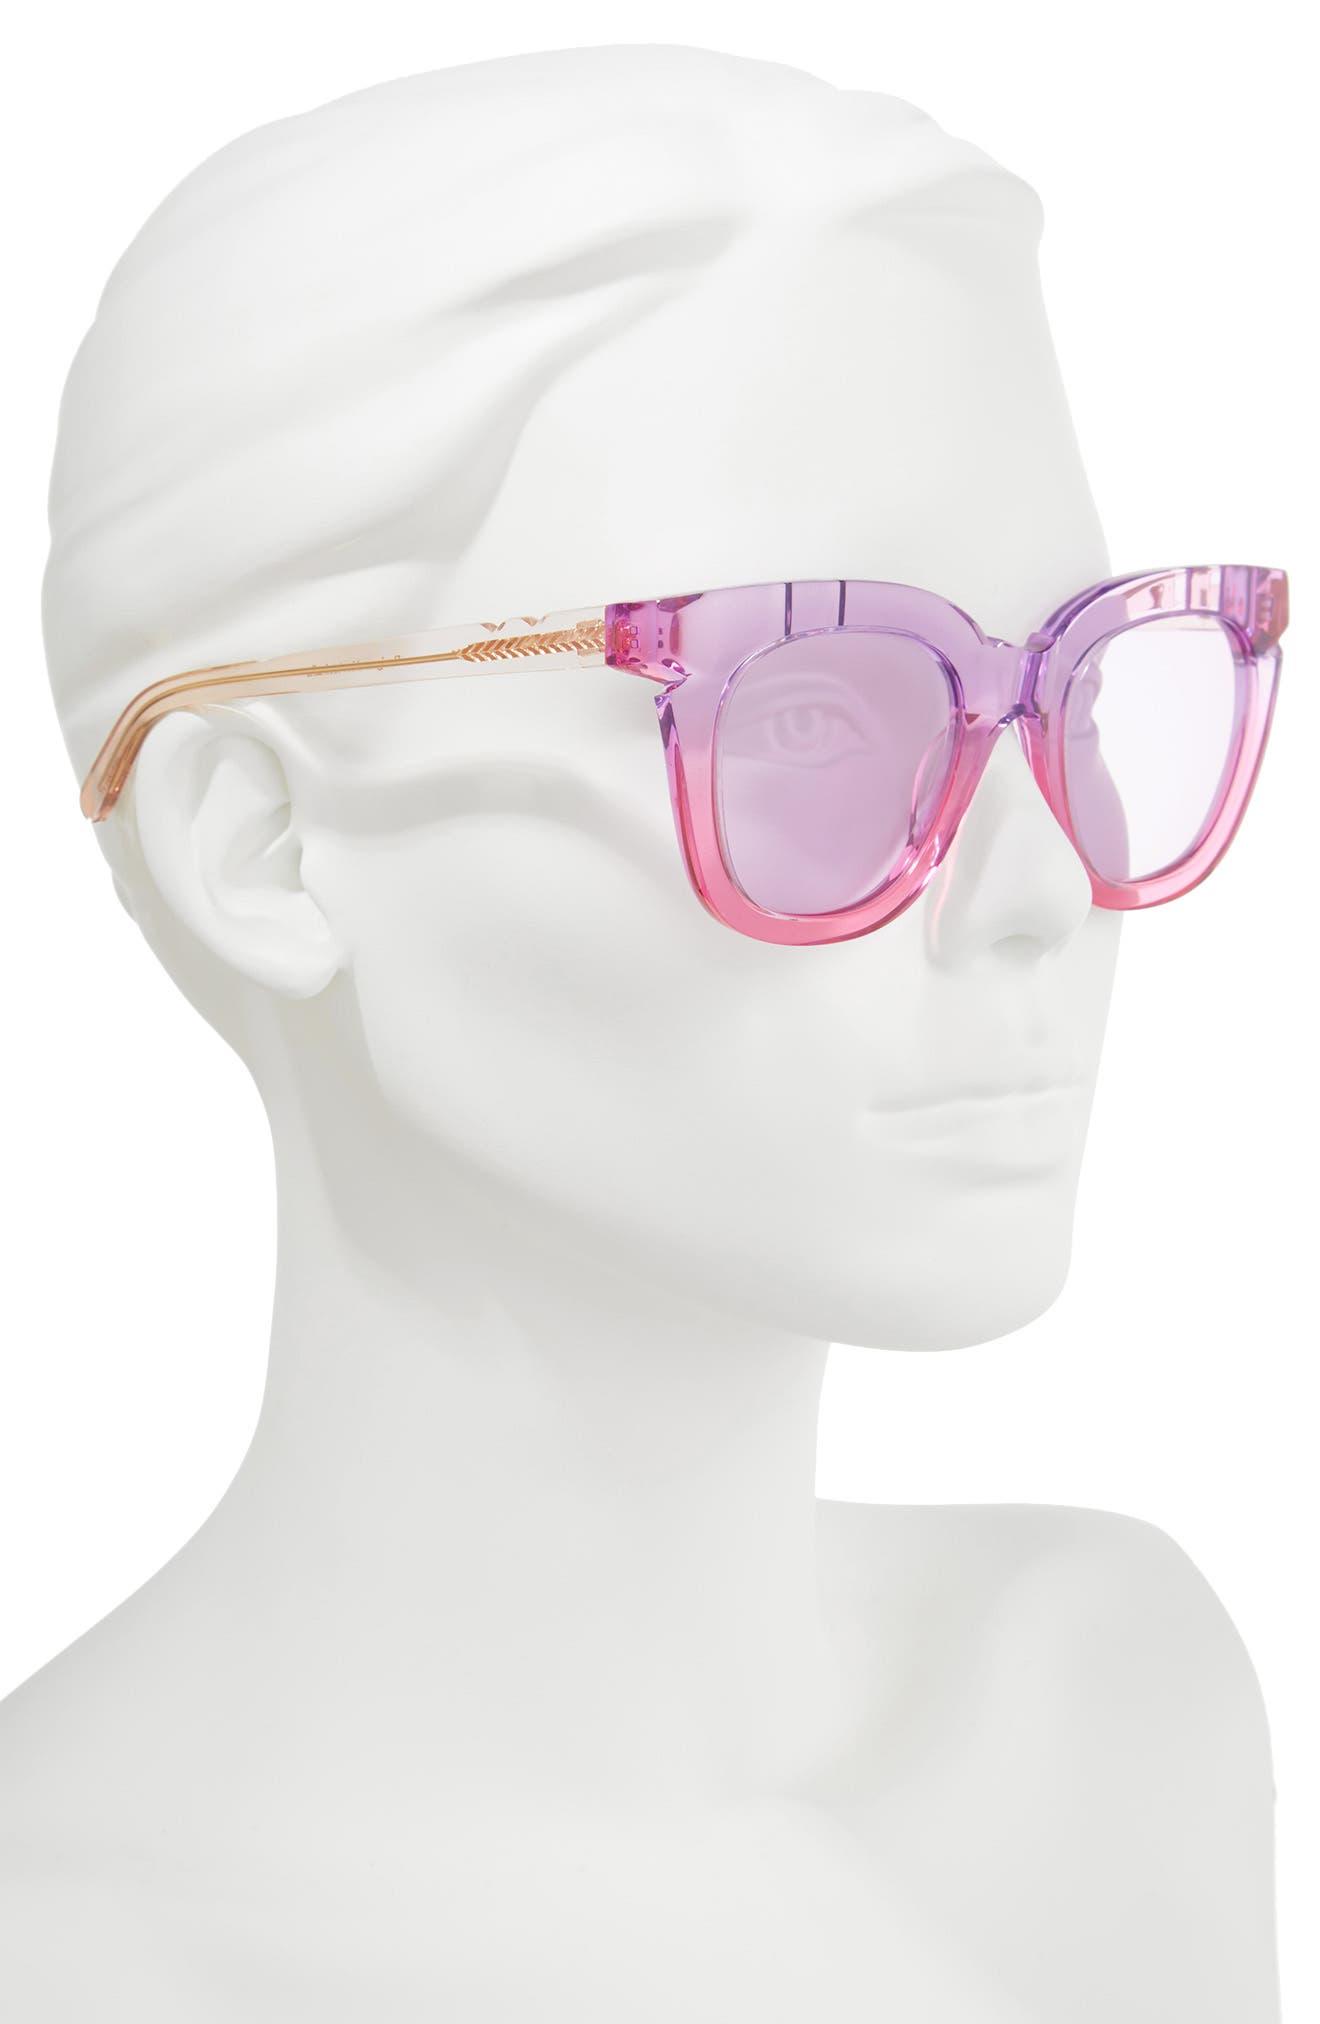 Pools & Palms 50mm Sunglasses,                             Alternate thumbnail 2, color,                             650